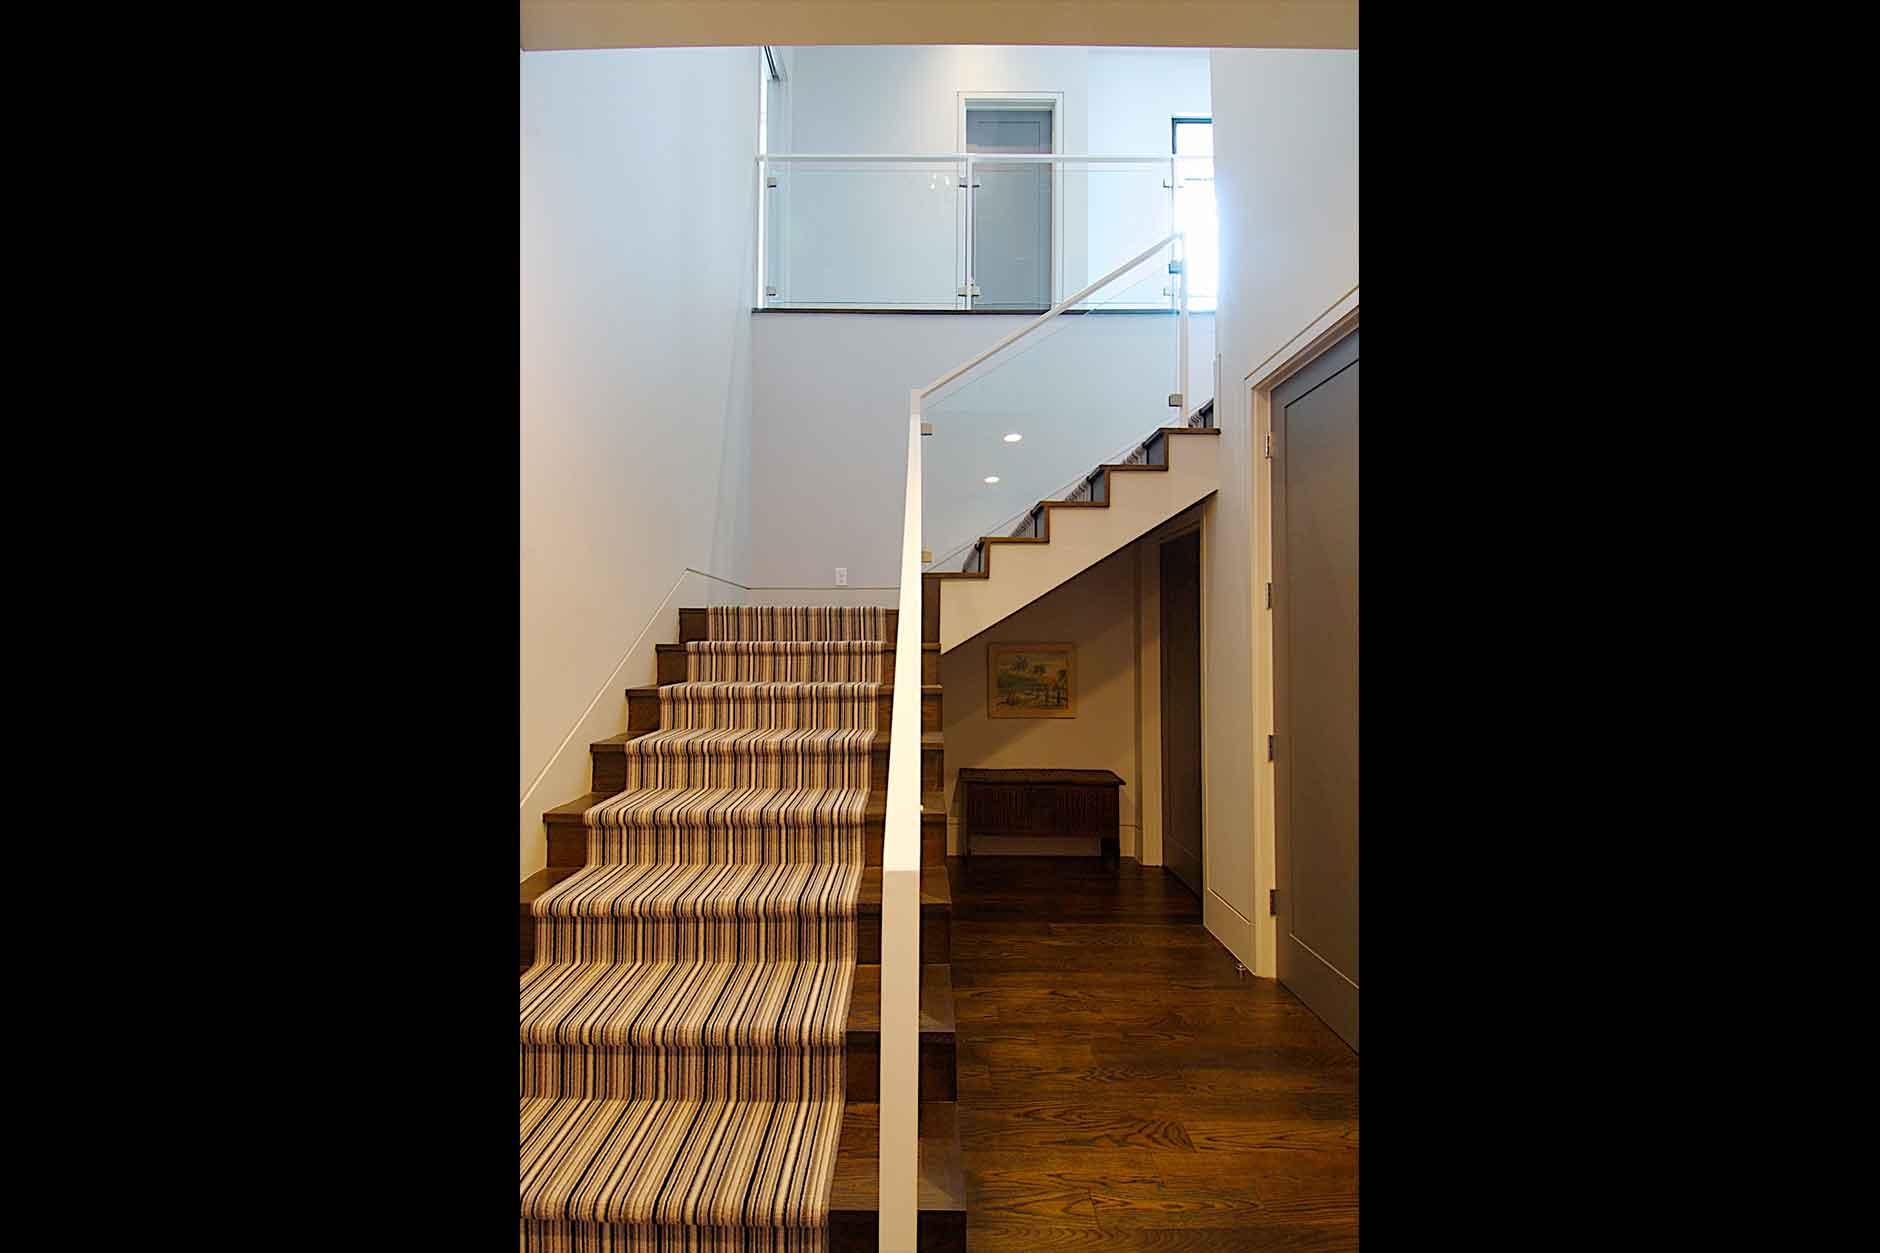 Redbud-Stairs1.jpg